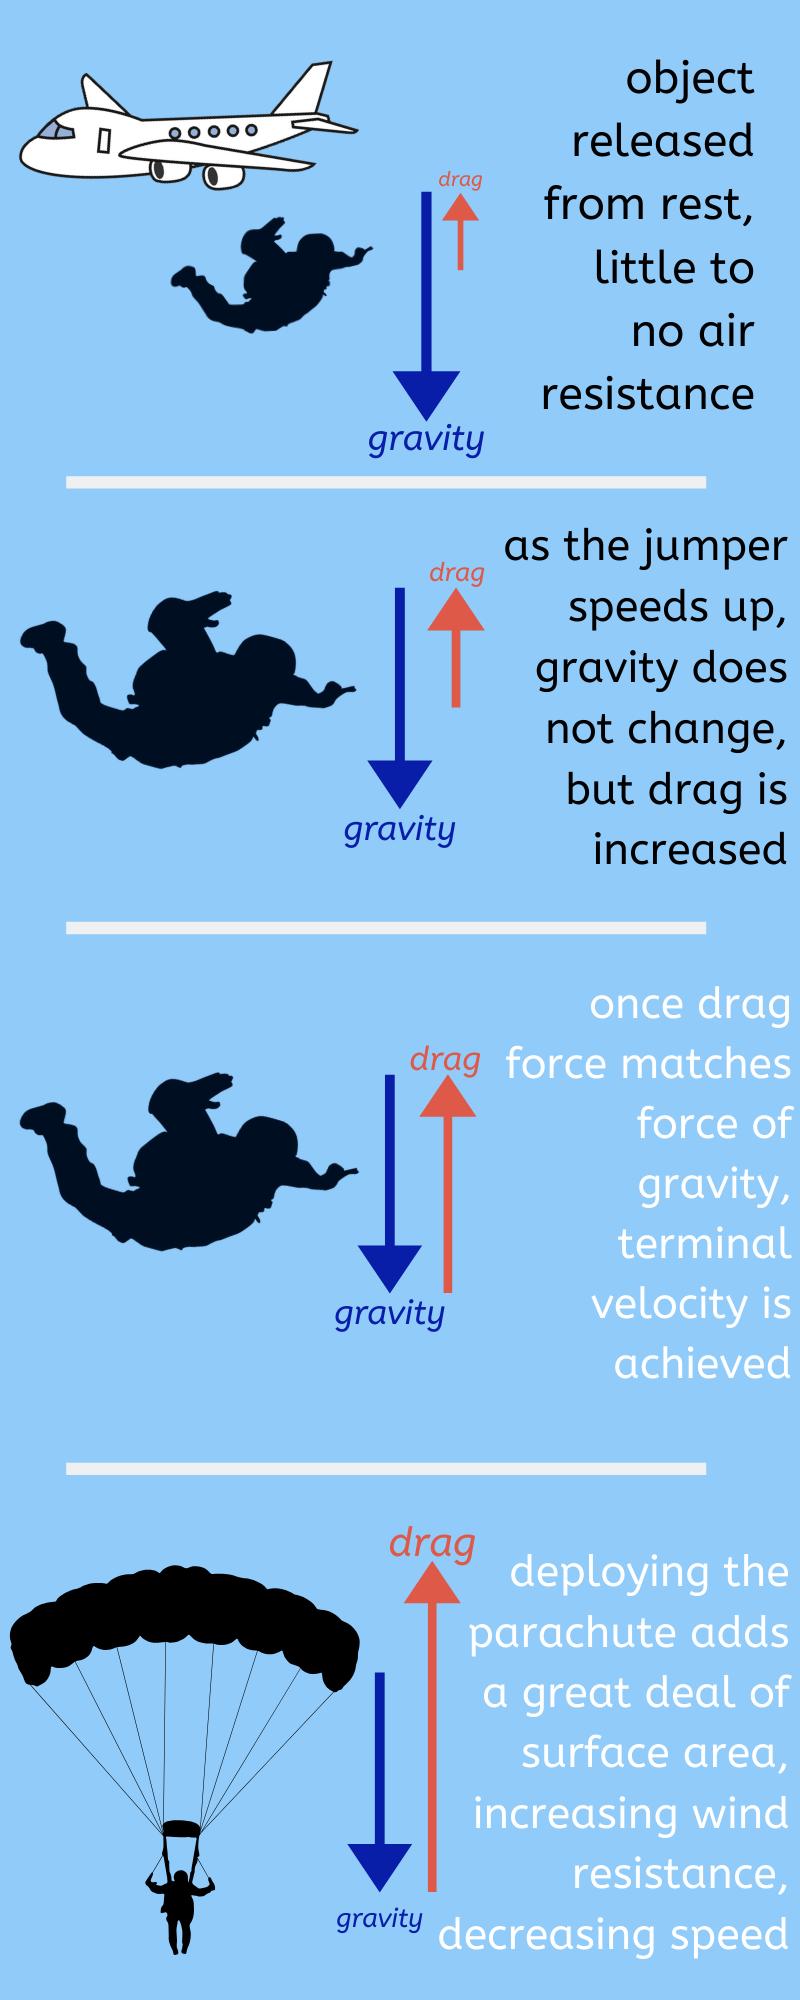 four panel terminal velocity infographic